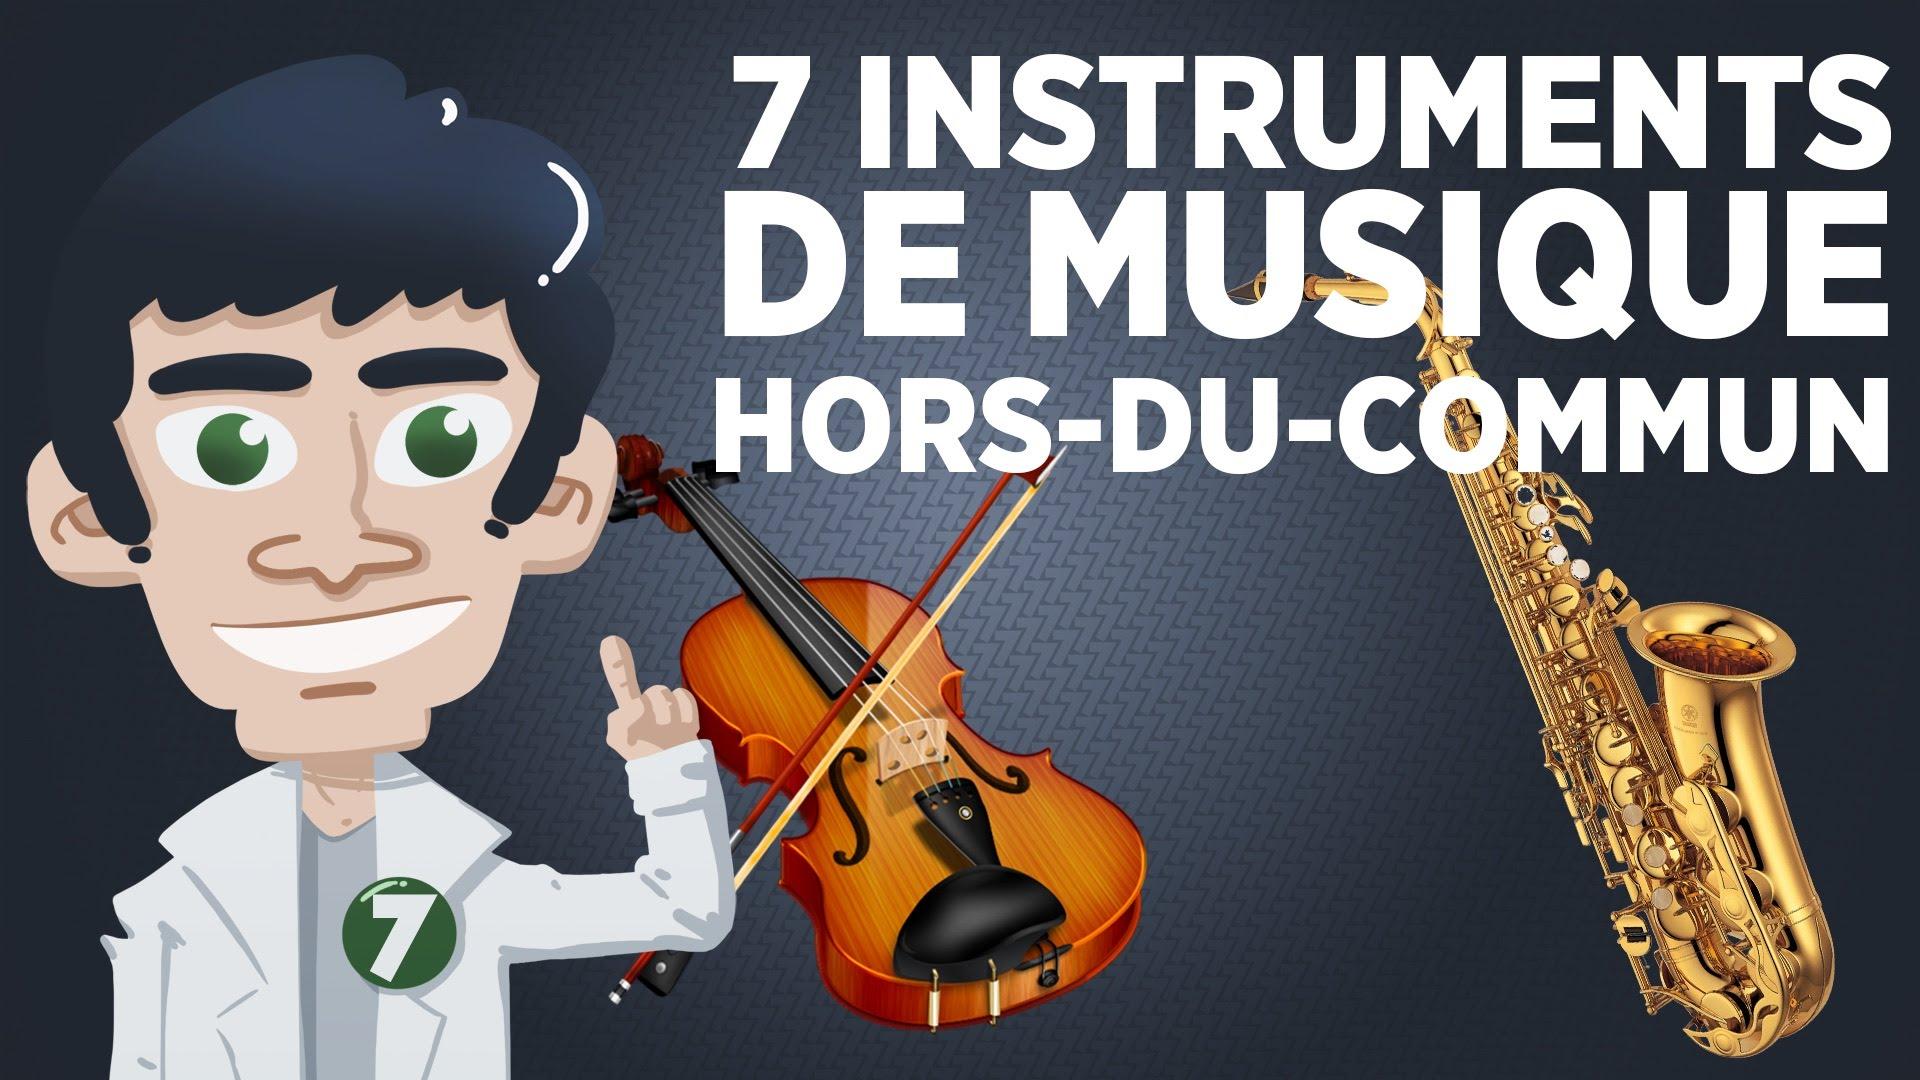 7 instruments de musique qui sortent de l 39 ordinaire breakforbuzz. Black Bedroom Furniture Sets. Home Design Ideas